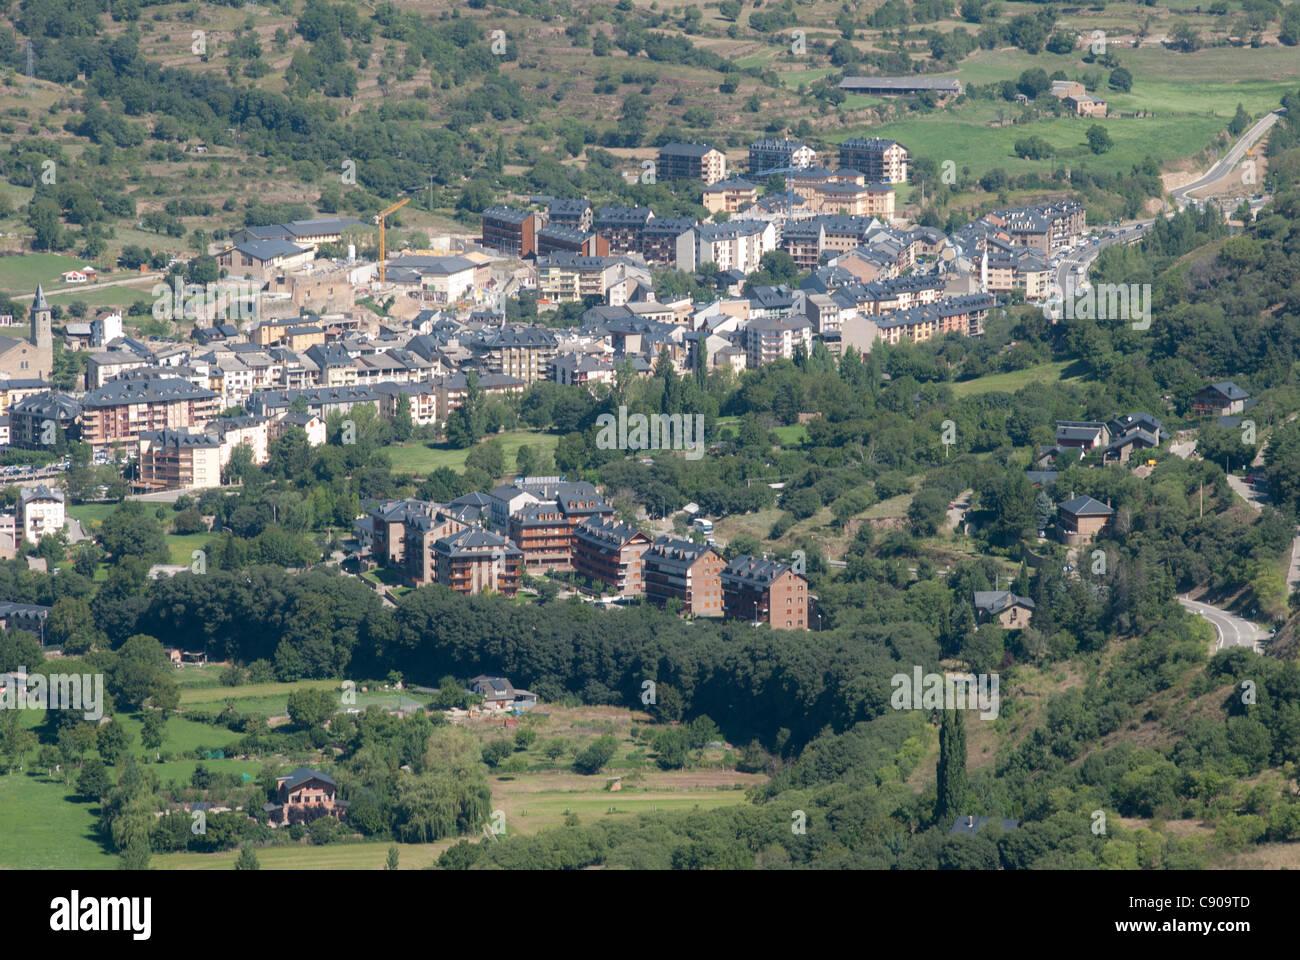 Sort - Pyrenees - Catalonia Spain - Stock Image